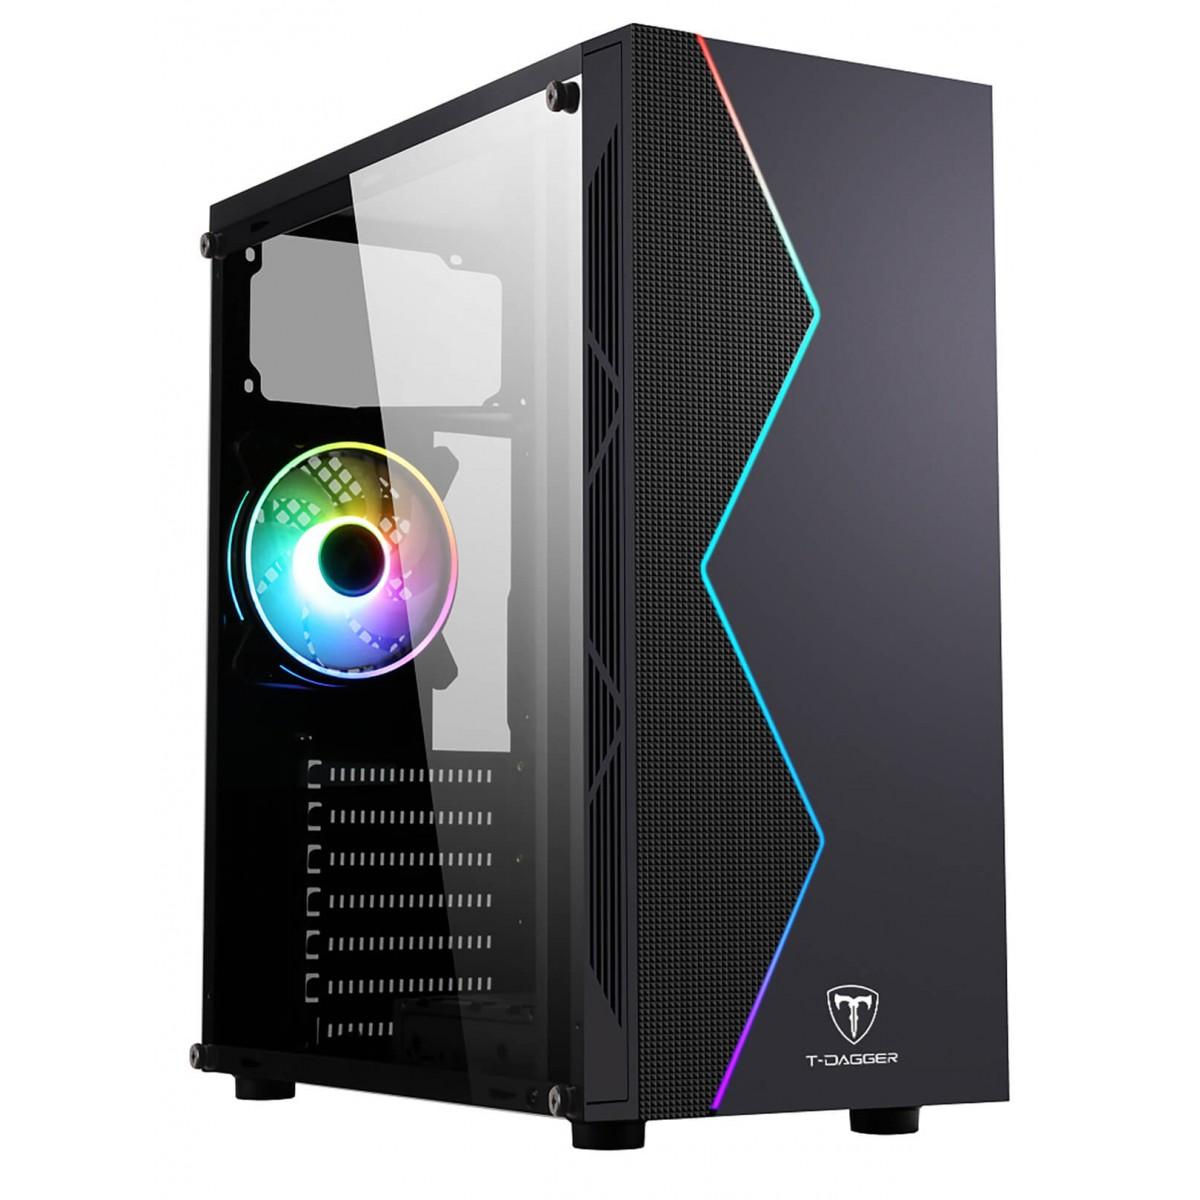 Computador Gamer, Intel 10º geração Core i3-10100F, Placa de Vídeo RX 550 4GB, 8GB DDR4, SSD 256GB